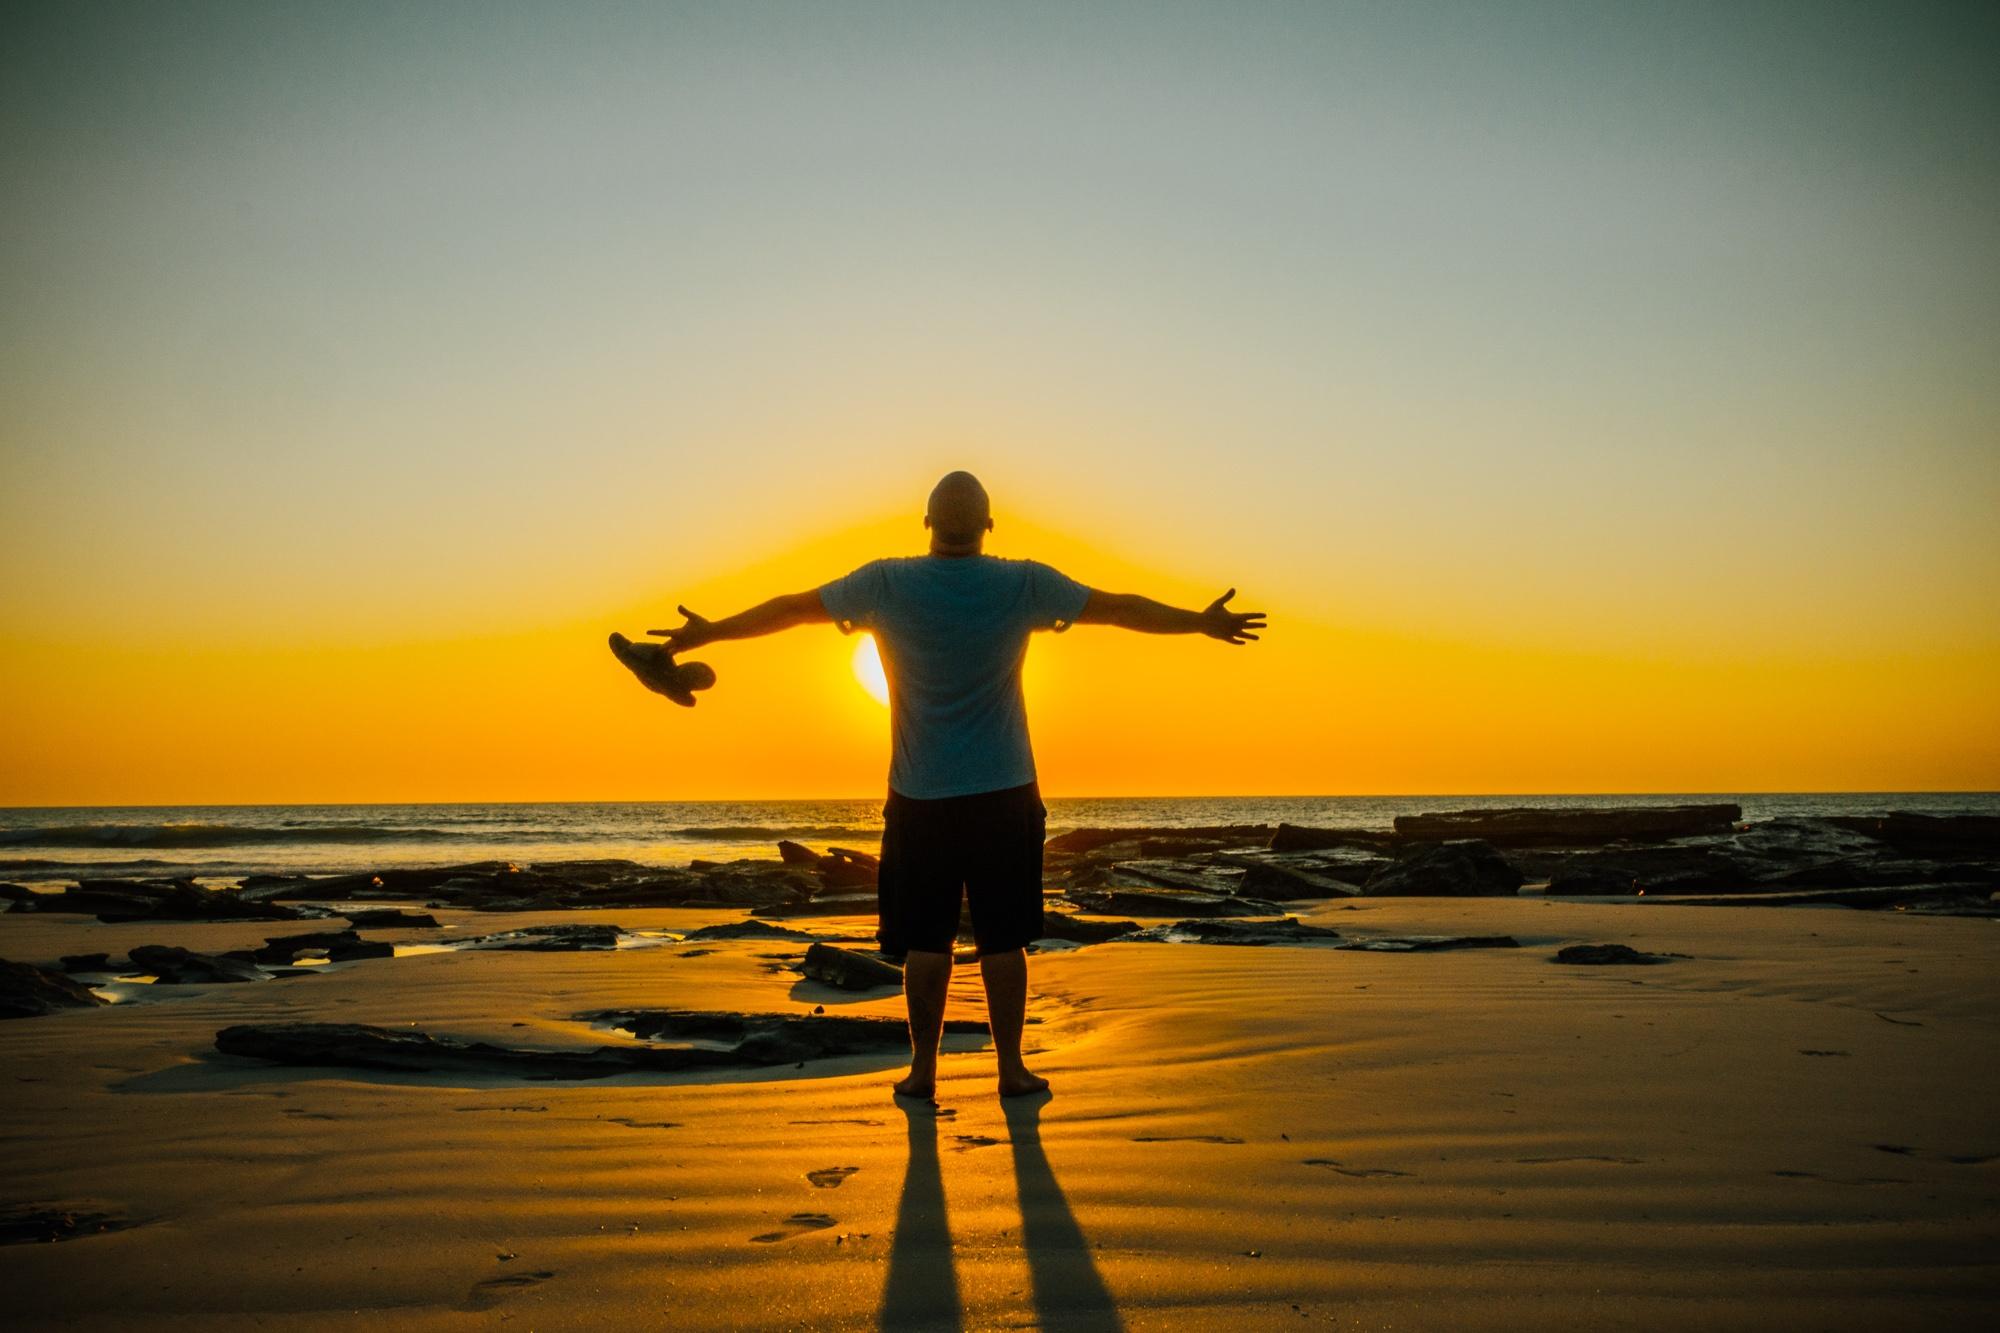 Sunset wes tcoast Australia